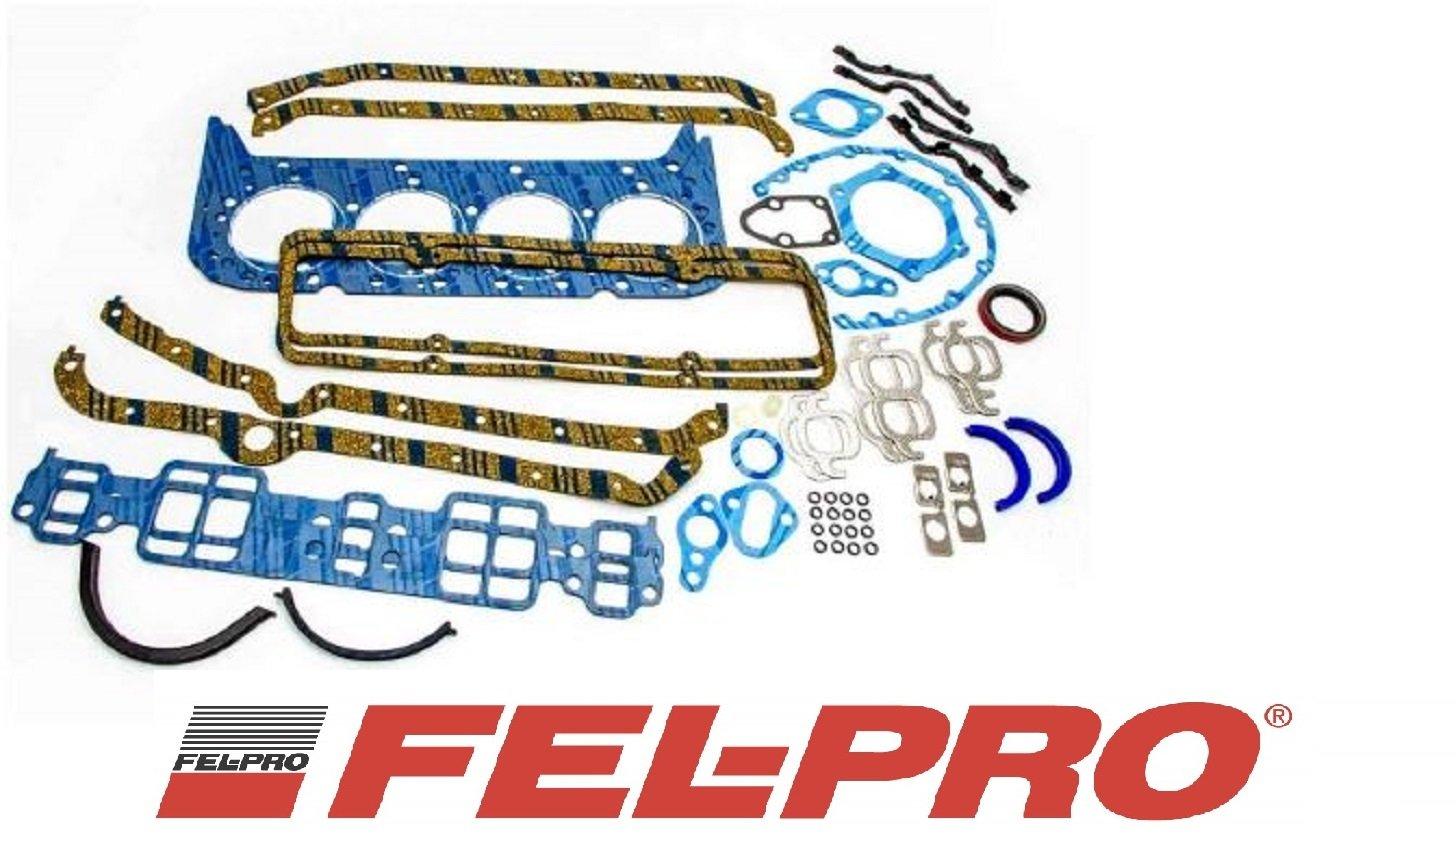 Fel Pro Engine Overhaul Gasket Set 1975-1980 Chevy TRUCK sb 305 5.0L (305 Truck) Fel-Pro